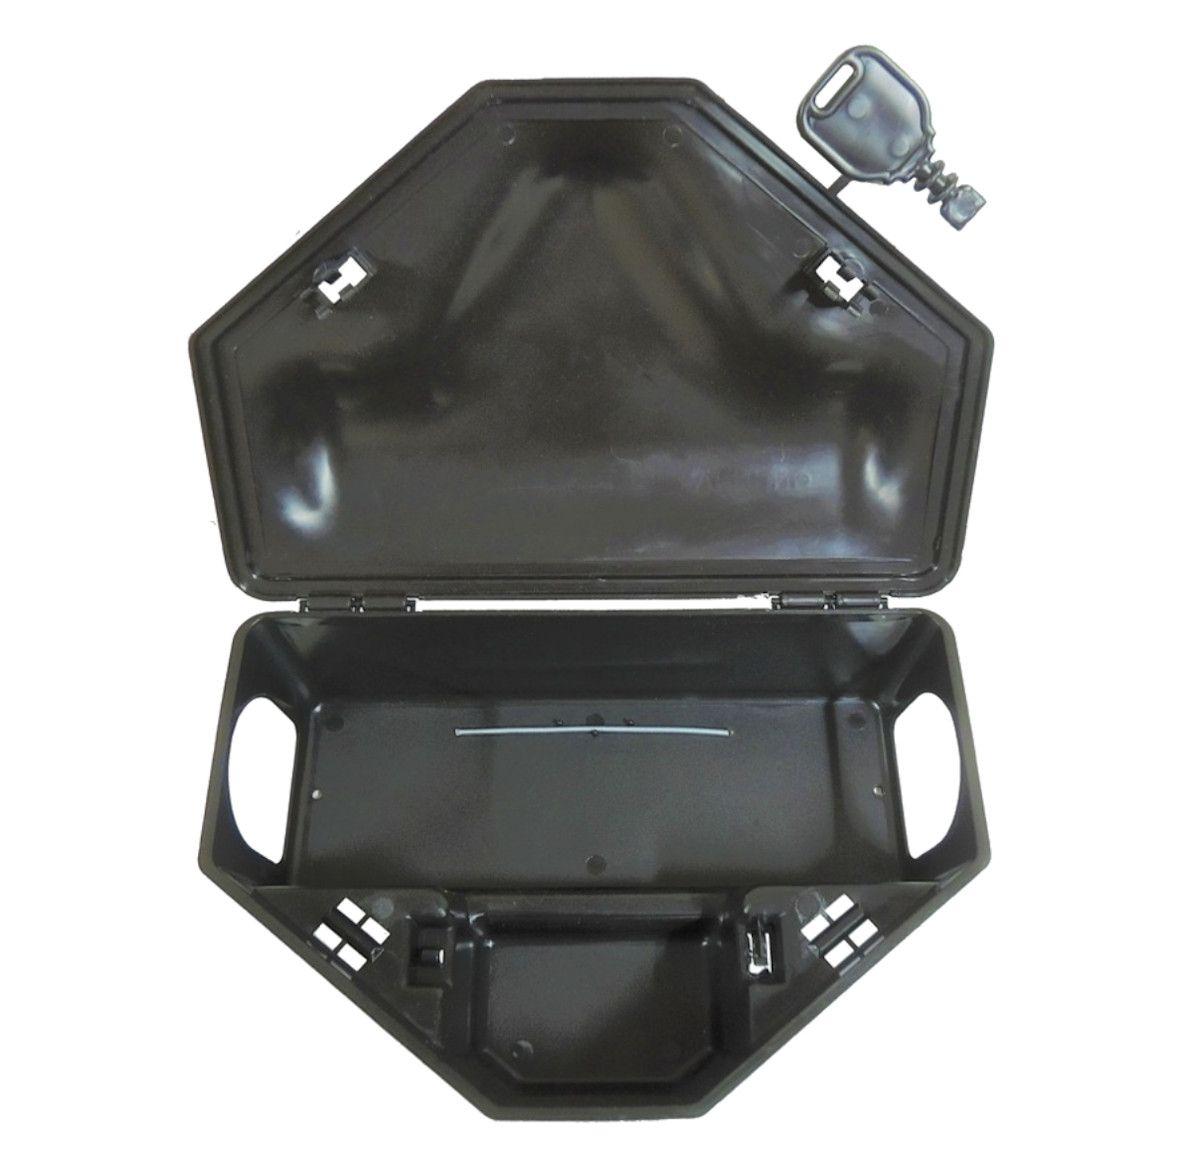 Kit 62 Porta Isca Com 2 Chaves - Duplo Travamento